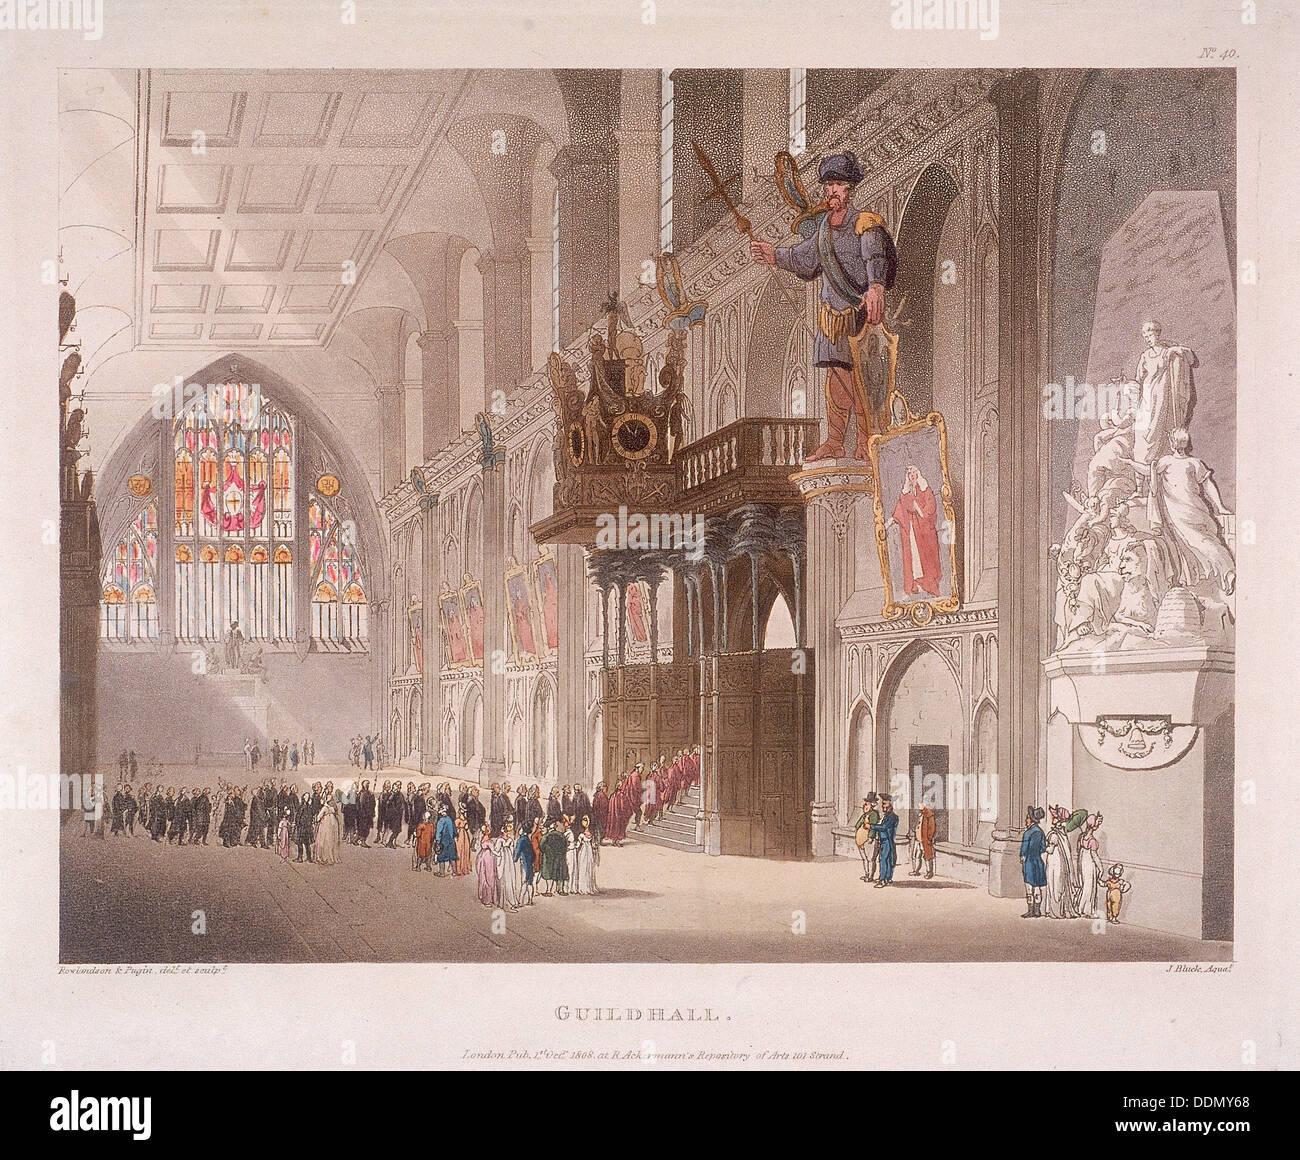 Guildhall, London, 1808. Artist: Augustus Charles Pugin - Stock Image